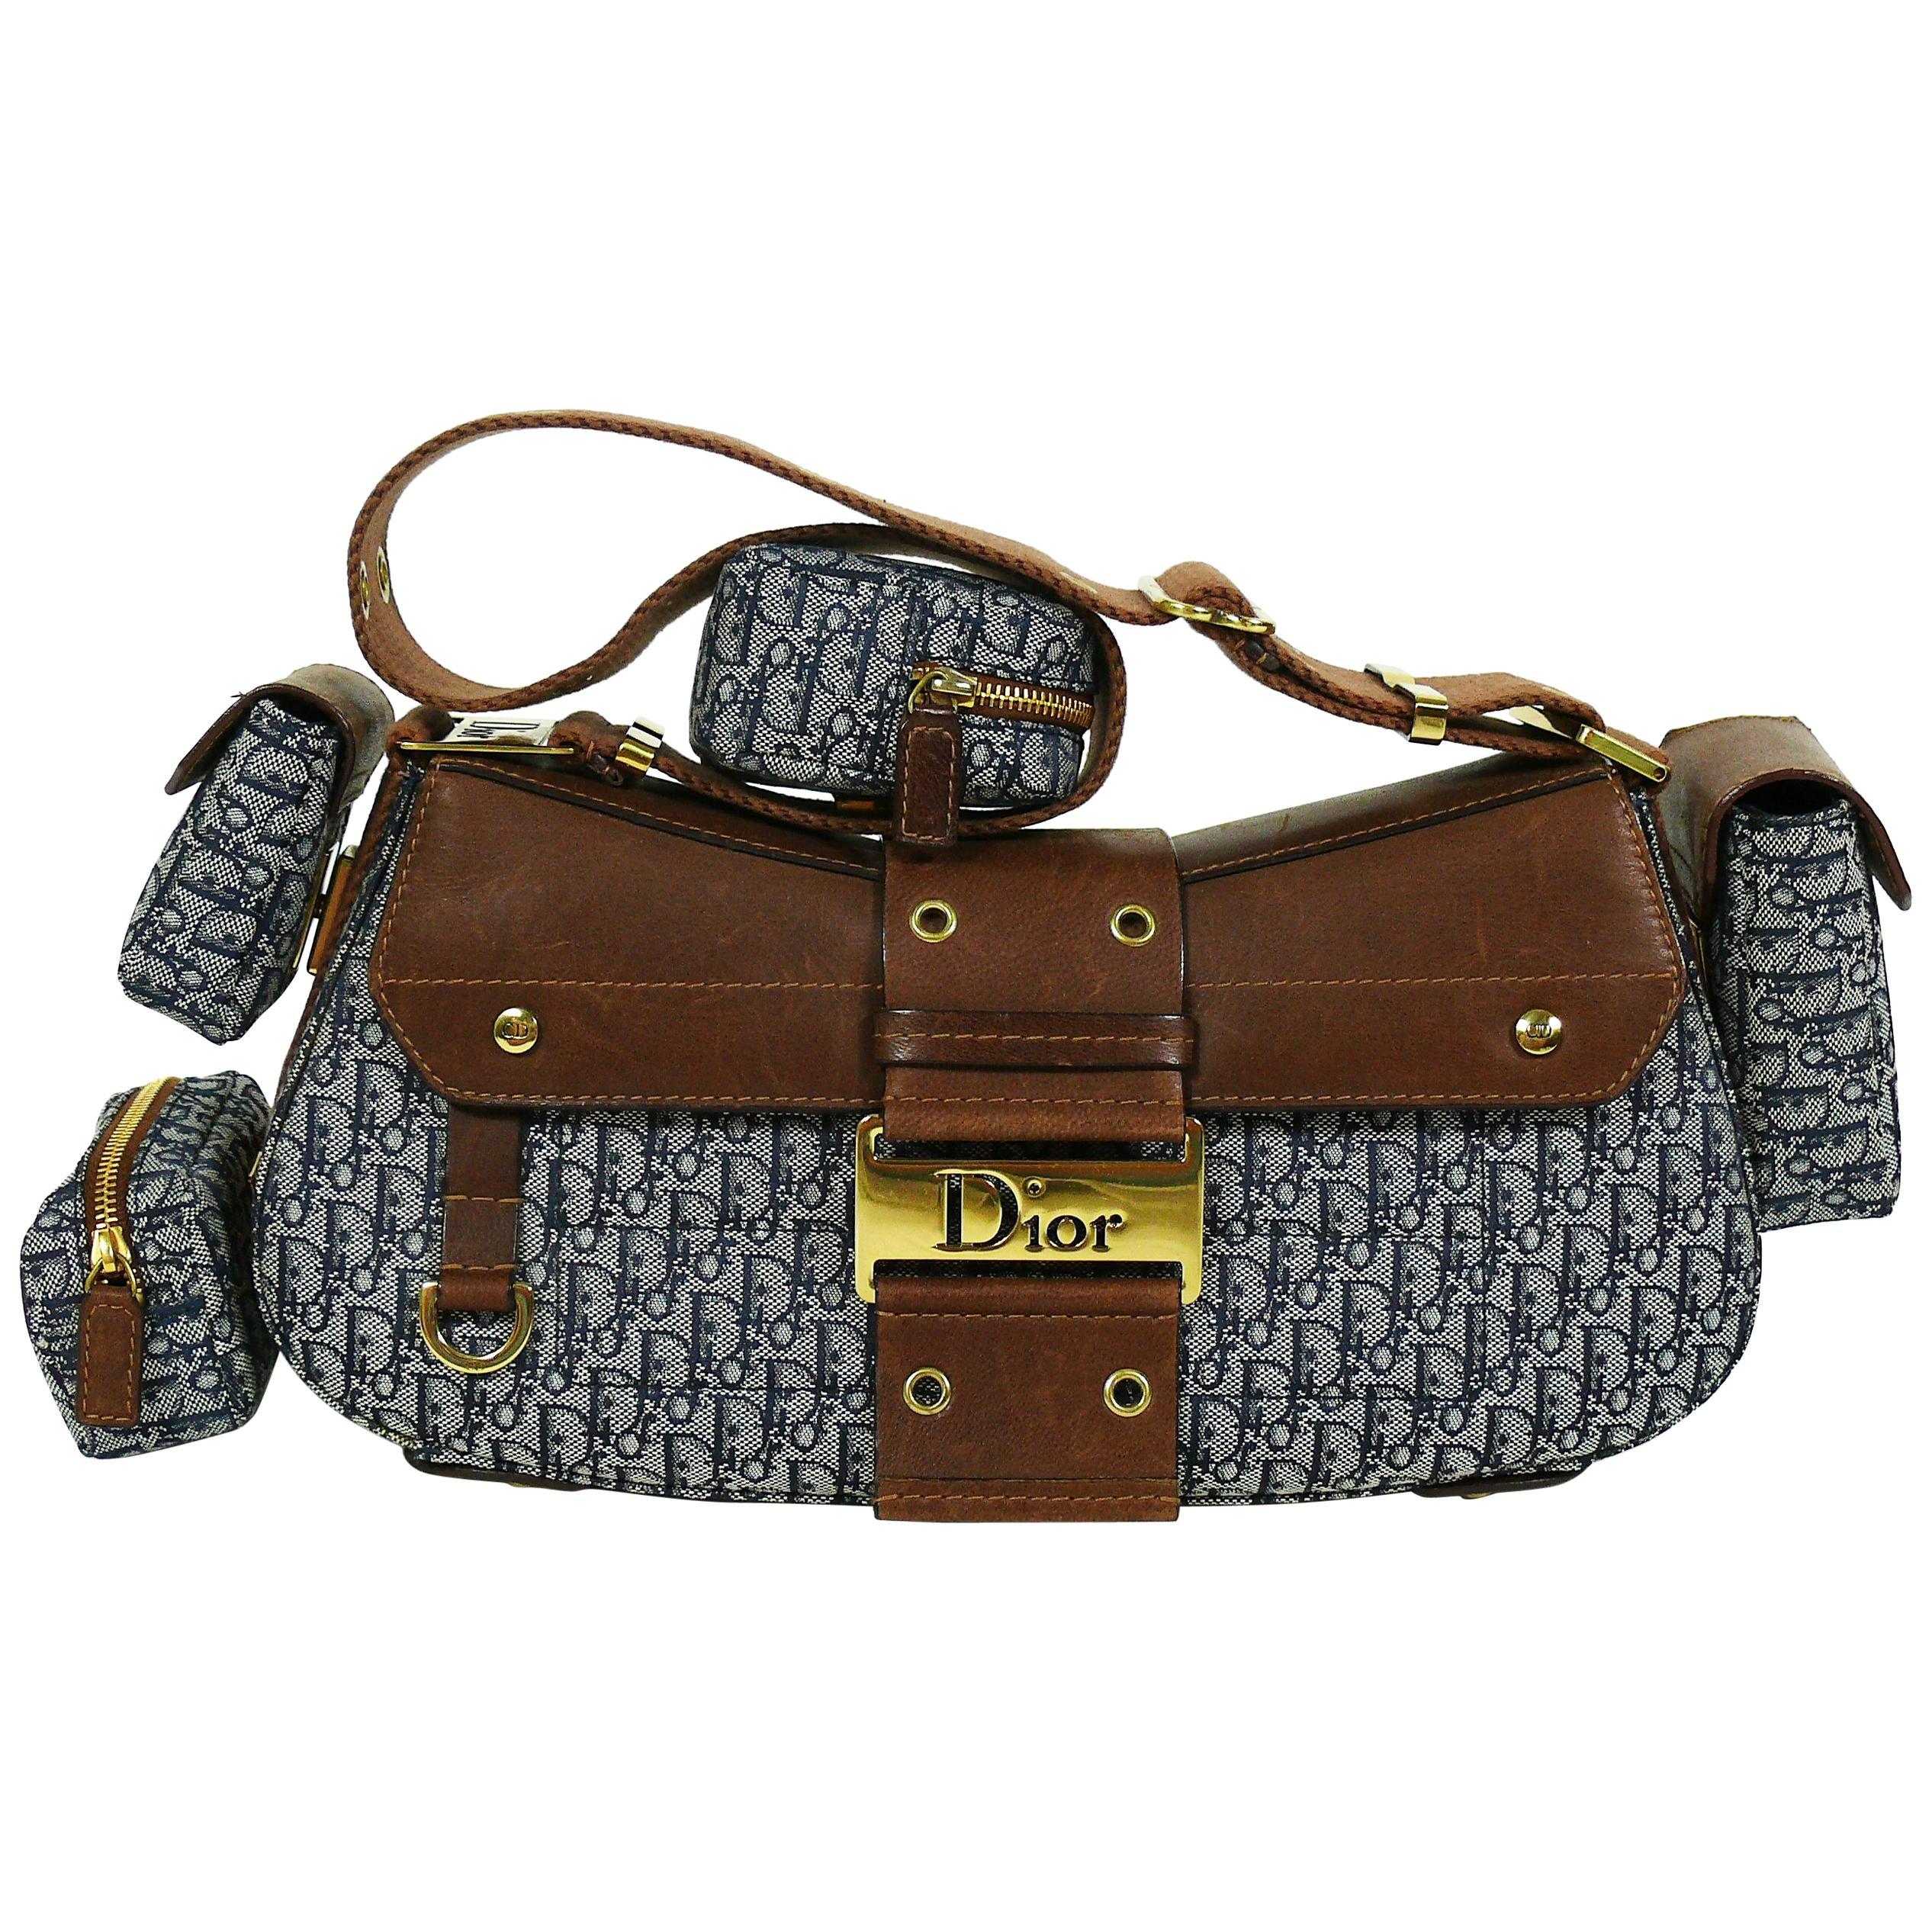 9c0141b7721c Christian Dior Street Chic Columbus Avenue Multipocket Shoulder Hand Bag at  1stdibs